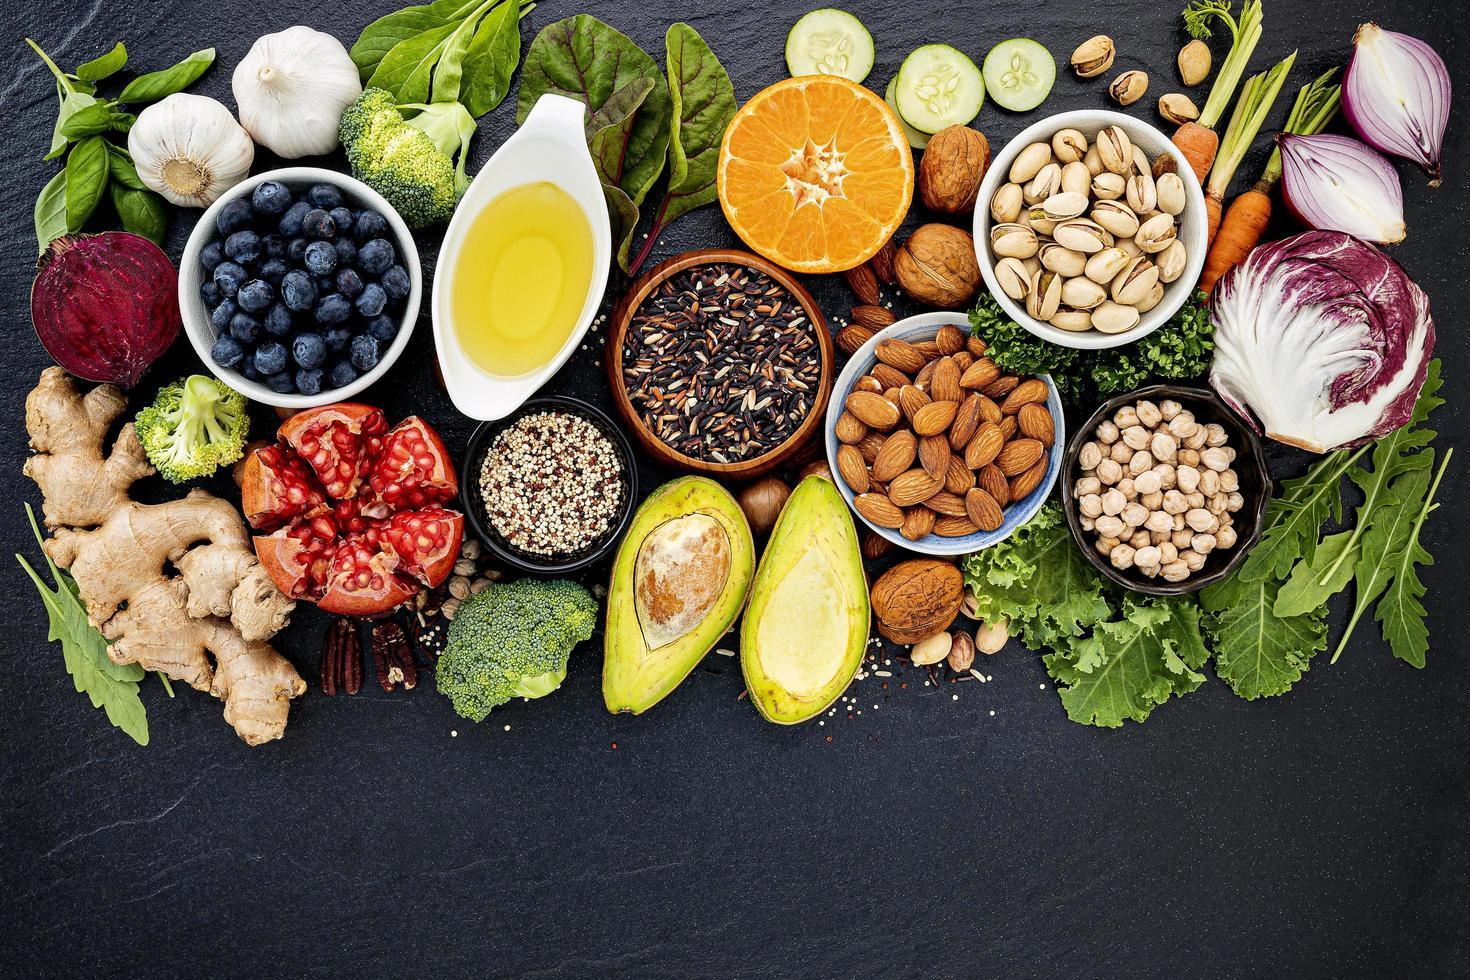 Top view of organic food photo